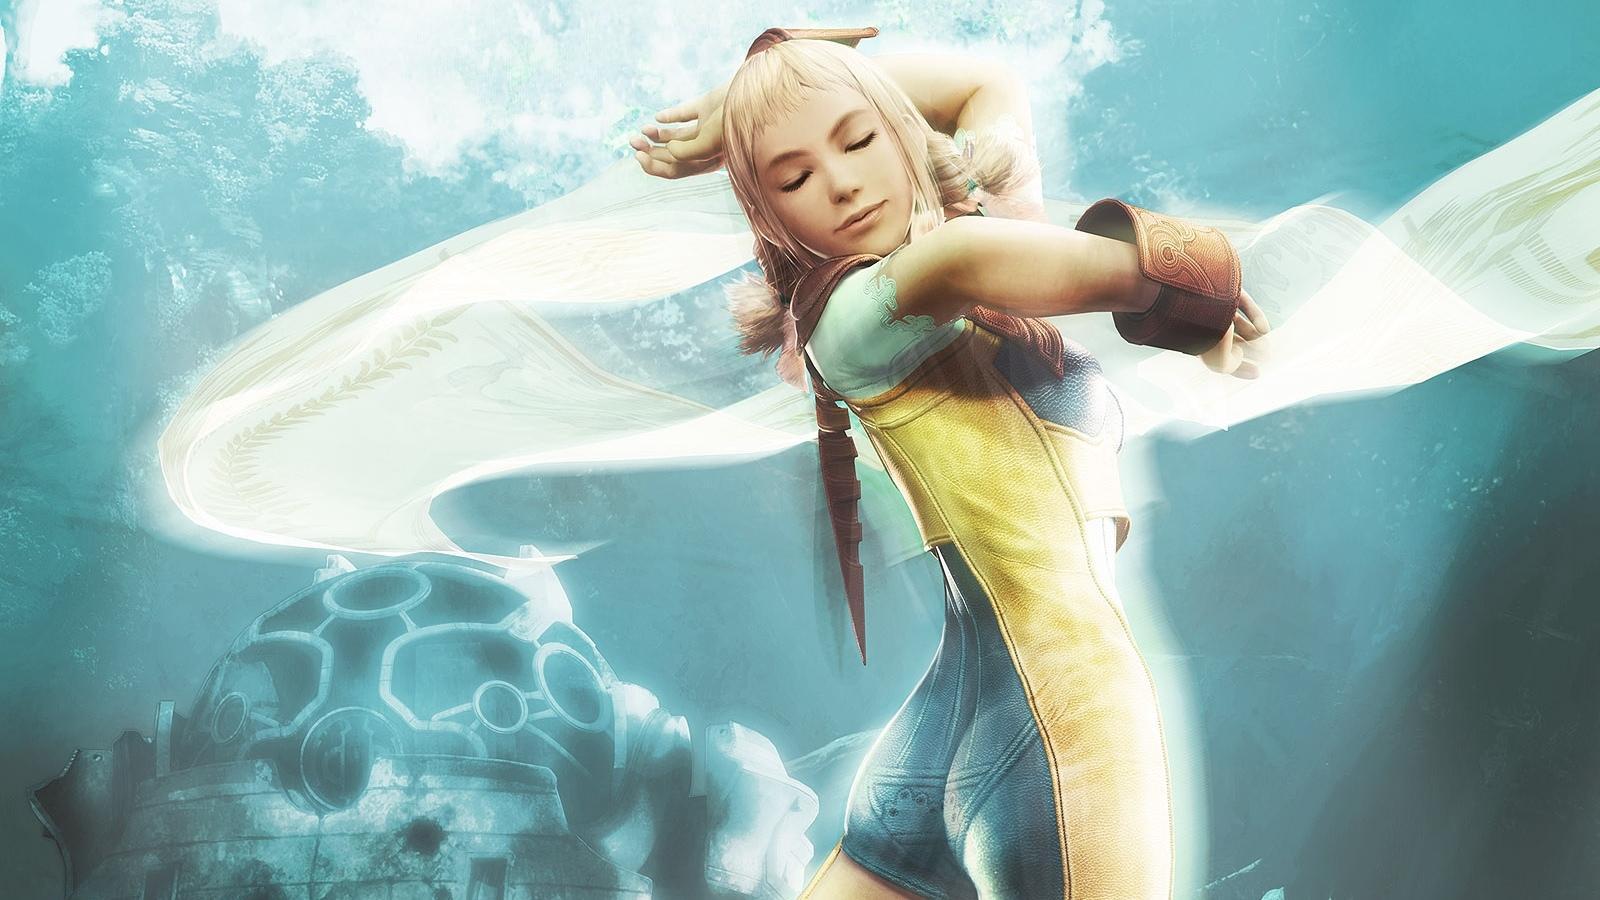 Free Download Final Fantasy Xii Wallpaper Hd Download 1600x900